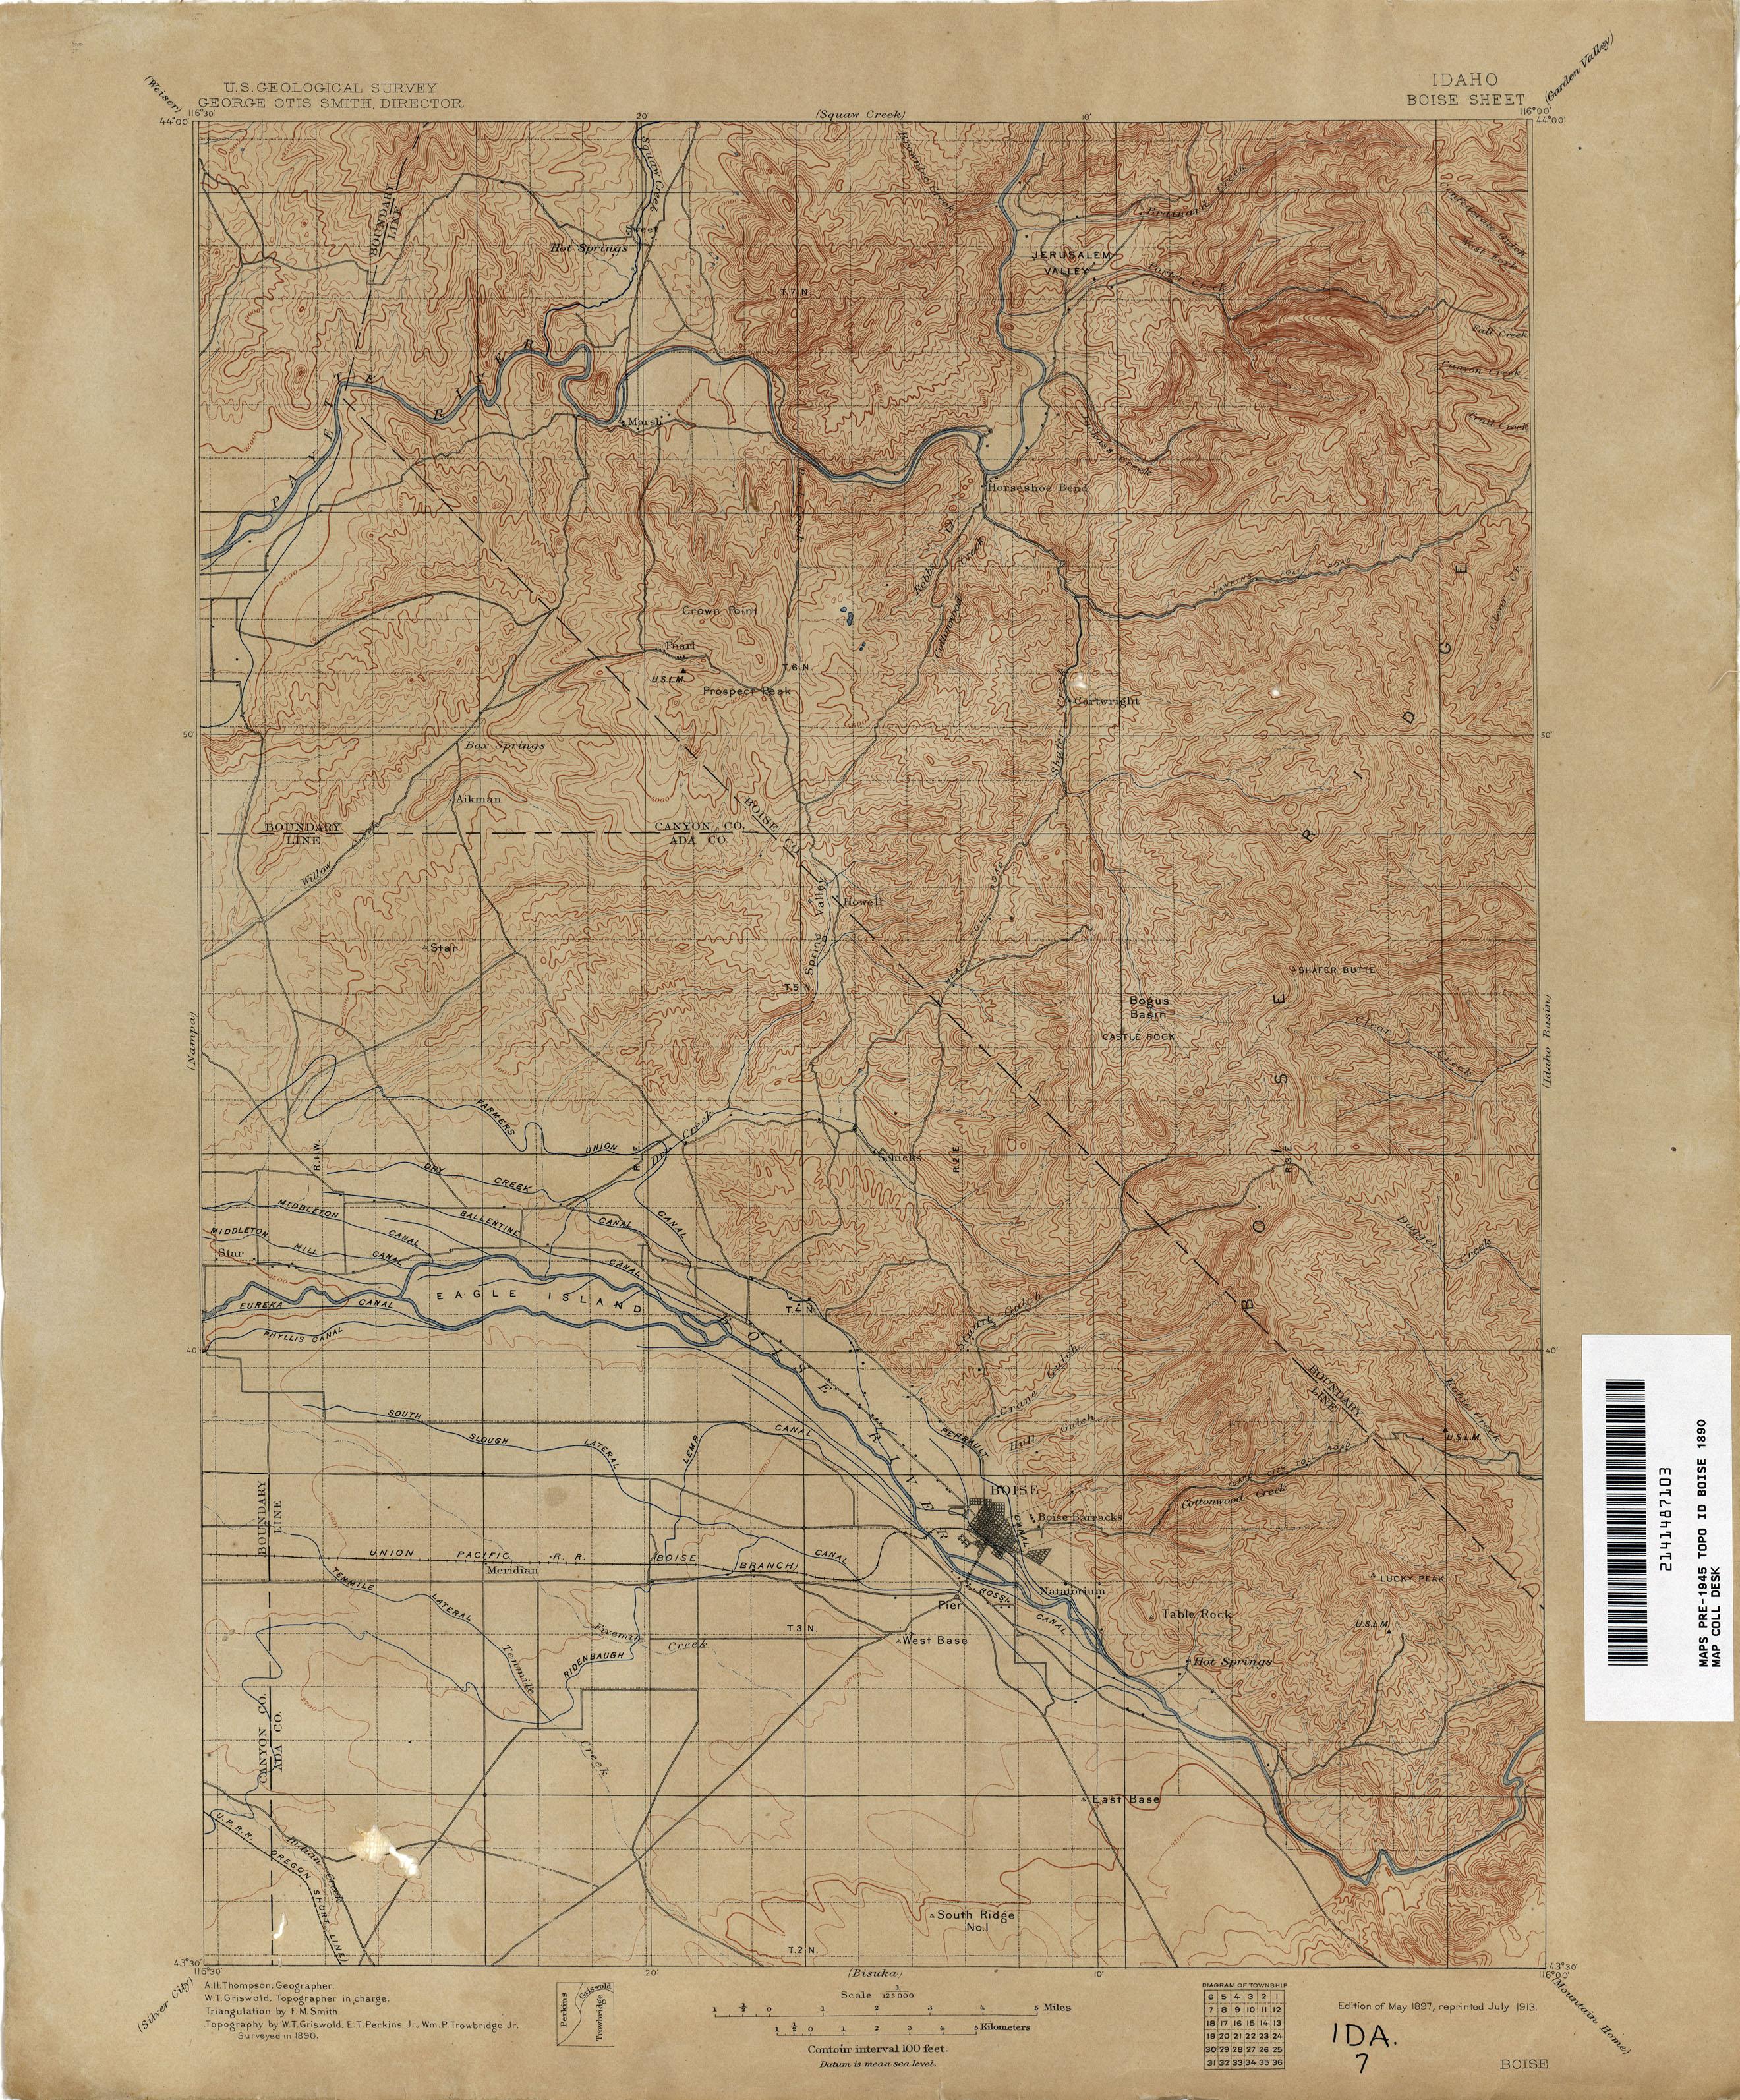 silver city idaho map Idaho Historical Topographic Maps Perry Castaneda Map Collection silver city idaho map